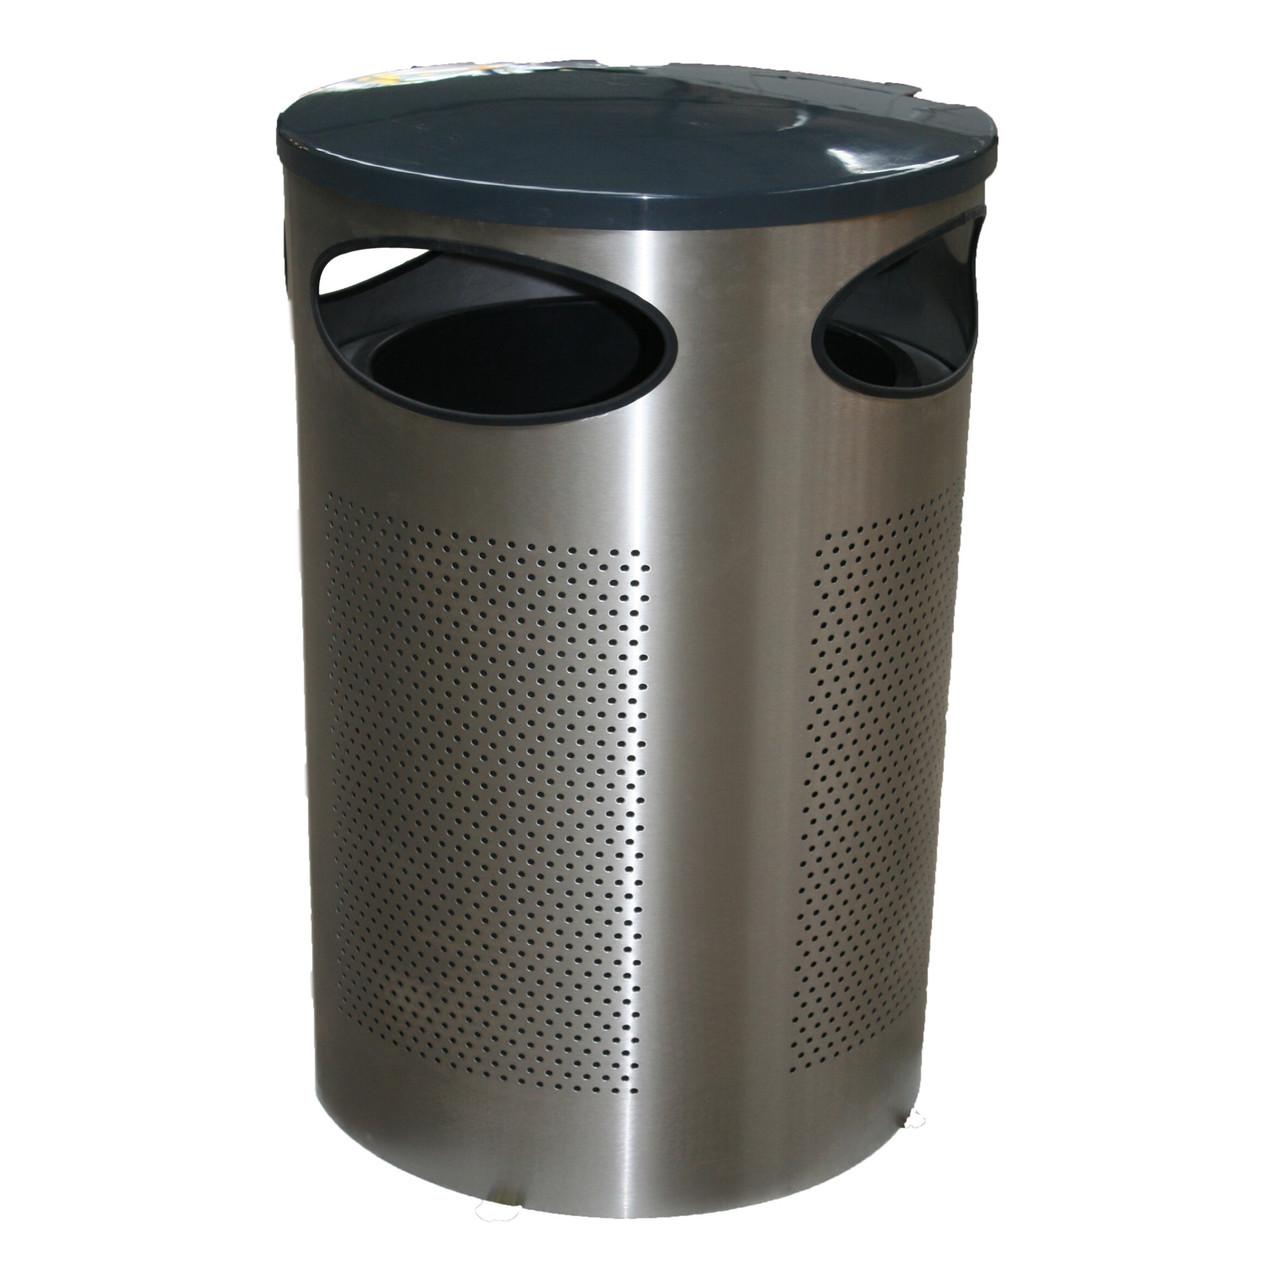 Halo 80 stainless steel metal blast resistant litter bin